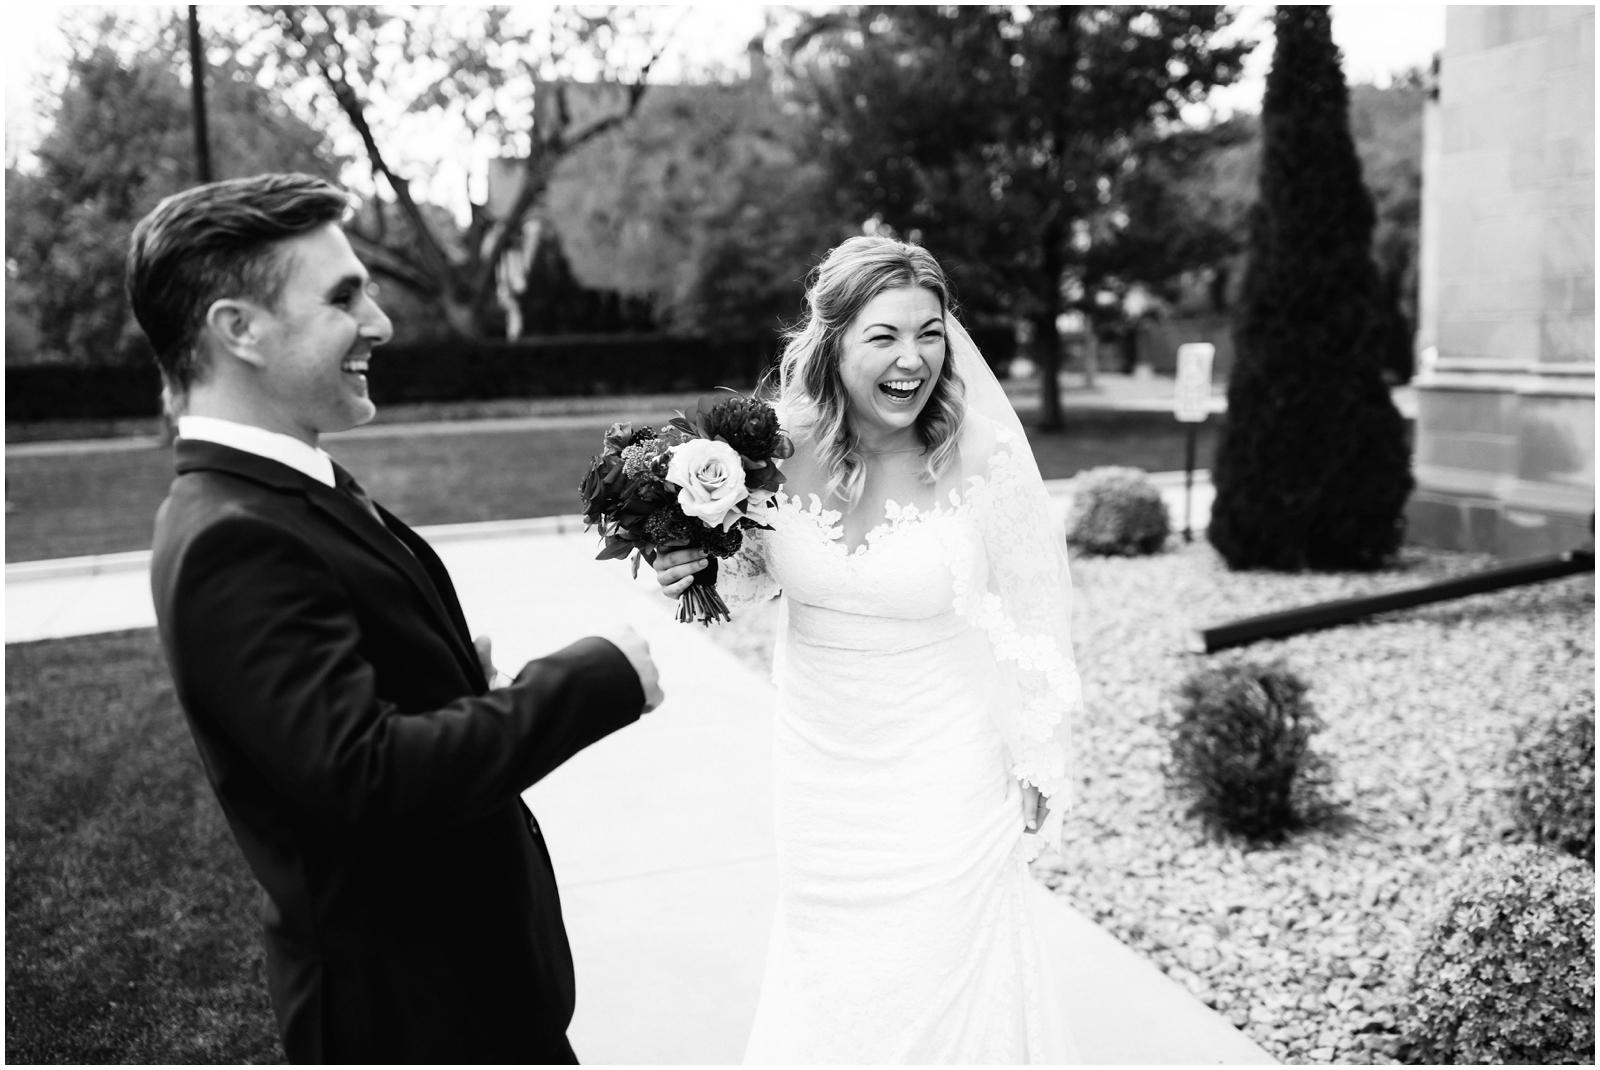 Minnesota Wedding Planner, Mpls Wedding Planner, Machine Shop MPLS, Mpls Wedding Venue . Bride and groom smiling